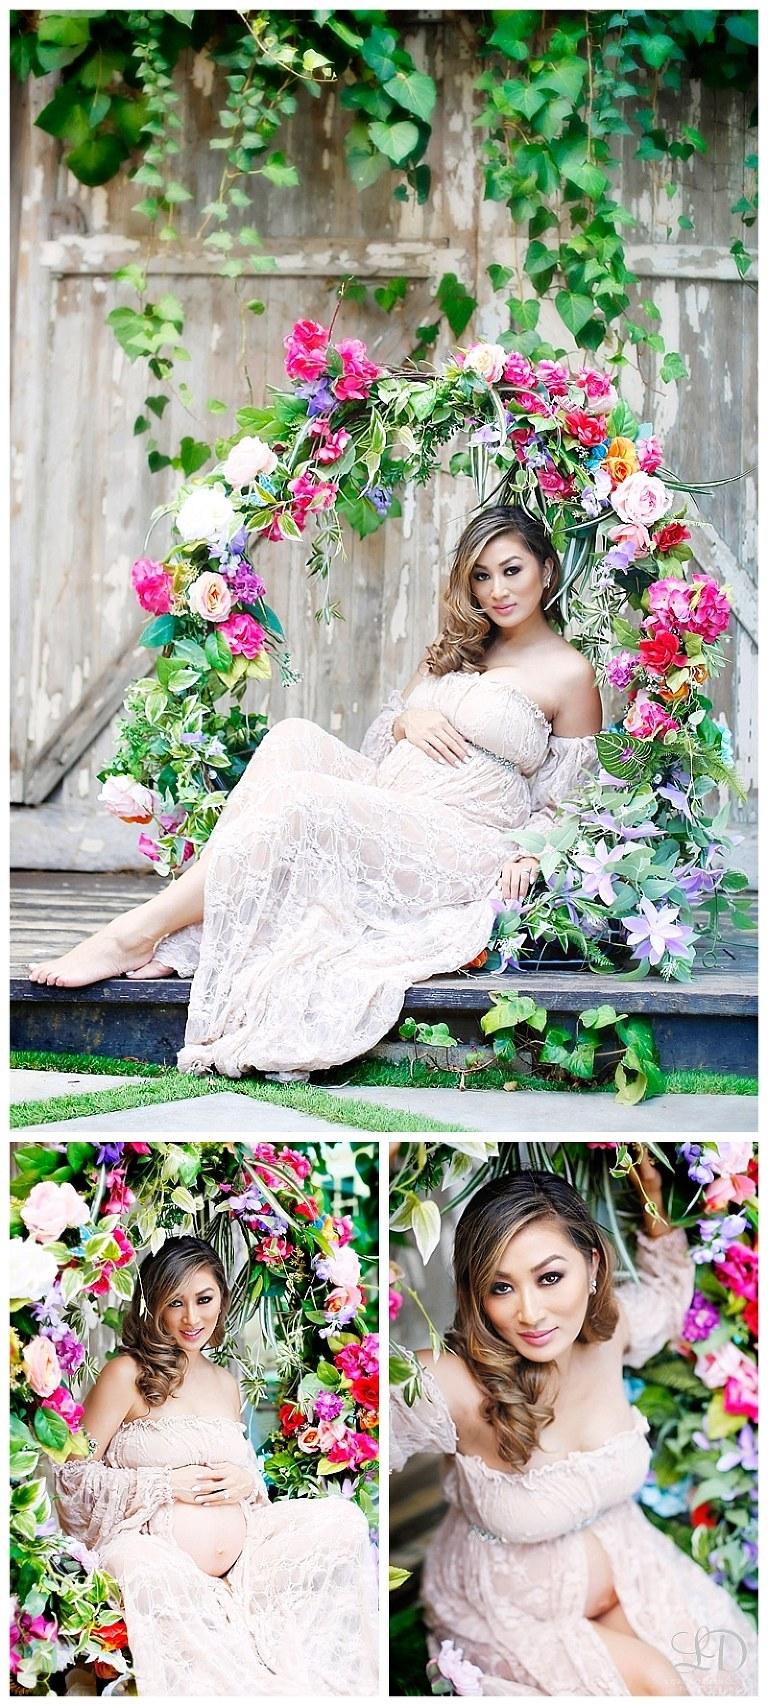 fantasy maternity photoshoot-magical maternity photoshoot-lori dorman photography_0375.jpg